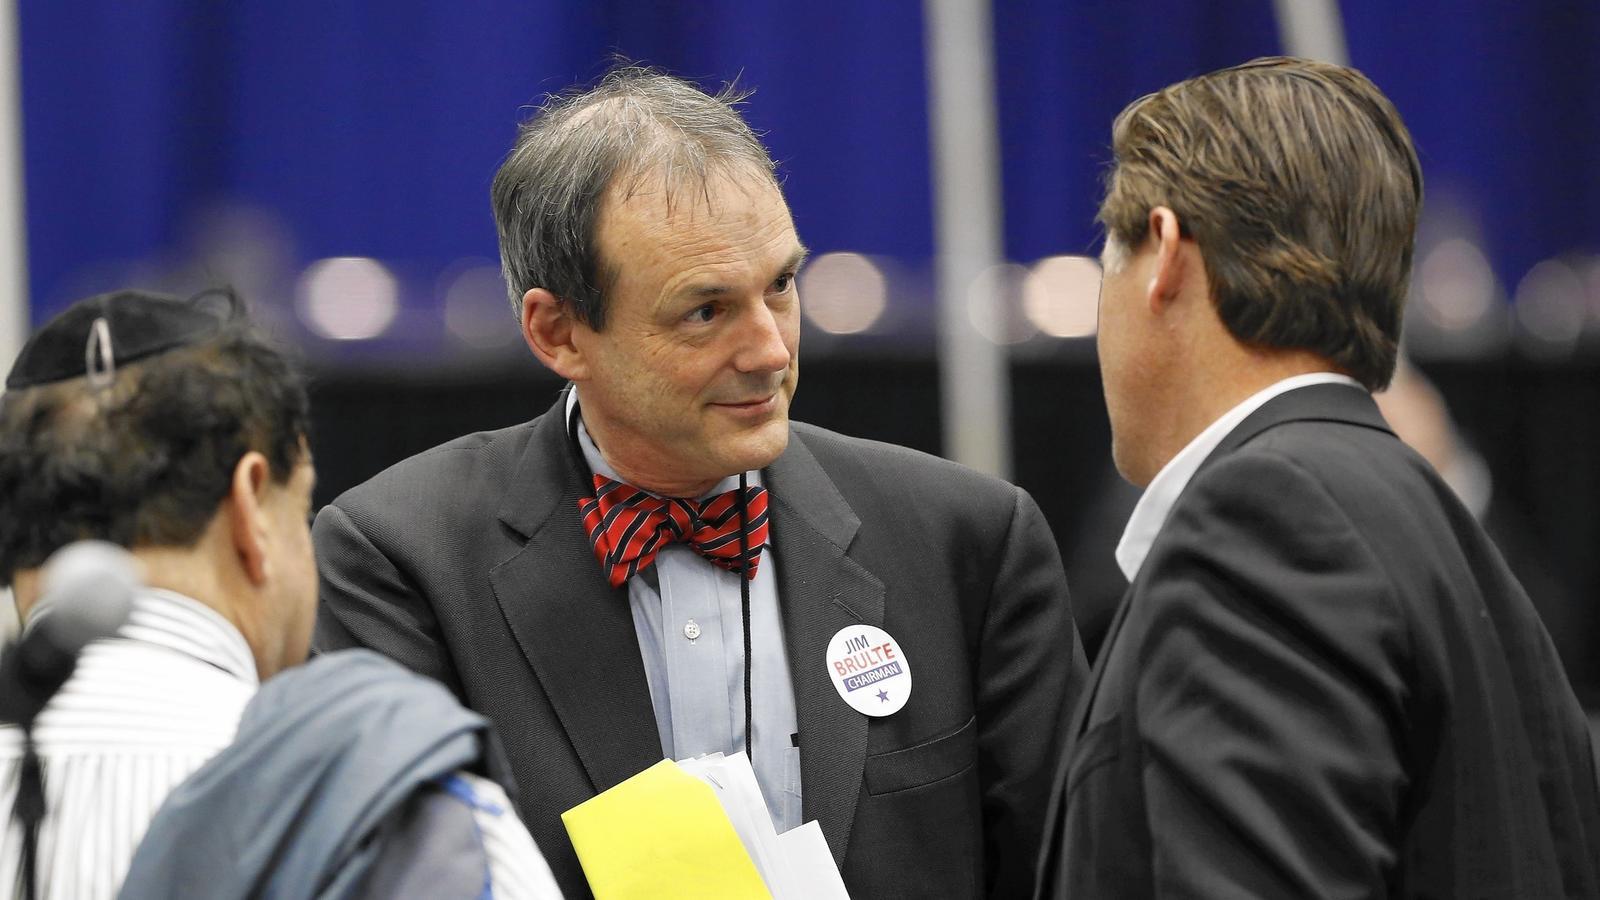 Charles Munger Jr. (Rich Pedroncelli / Associated Press)